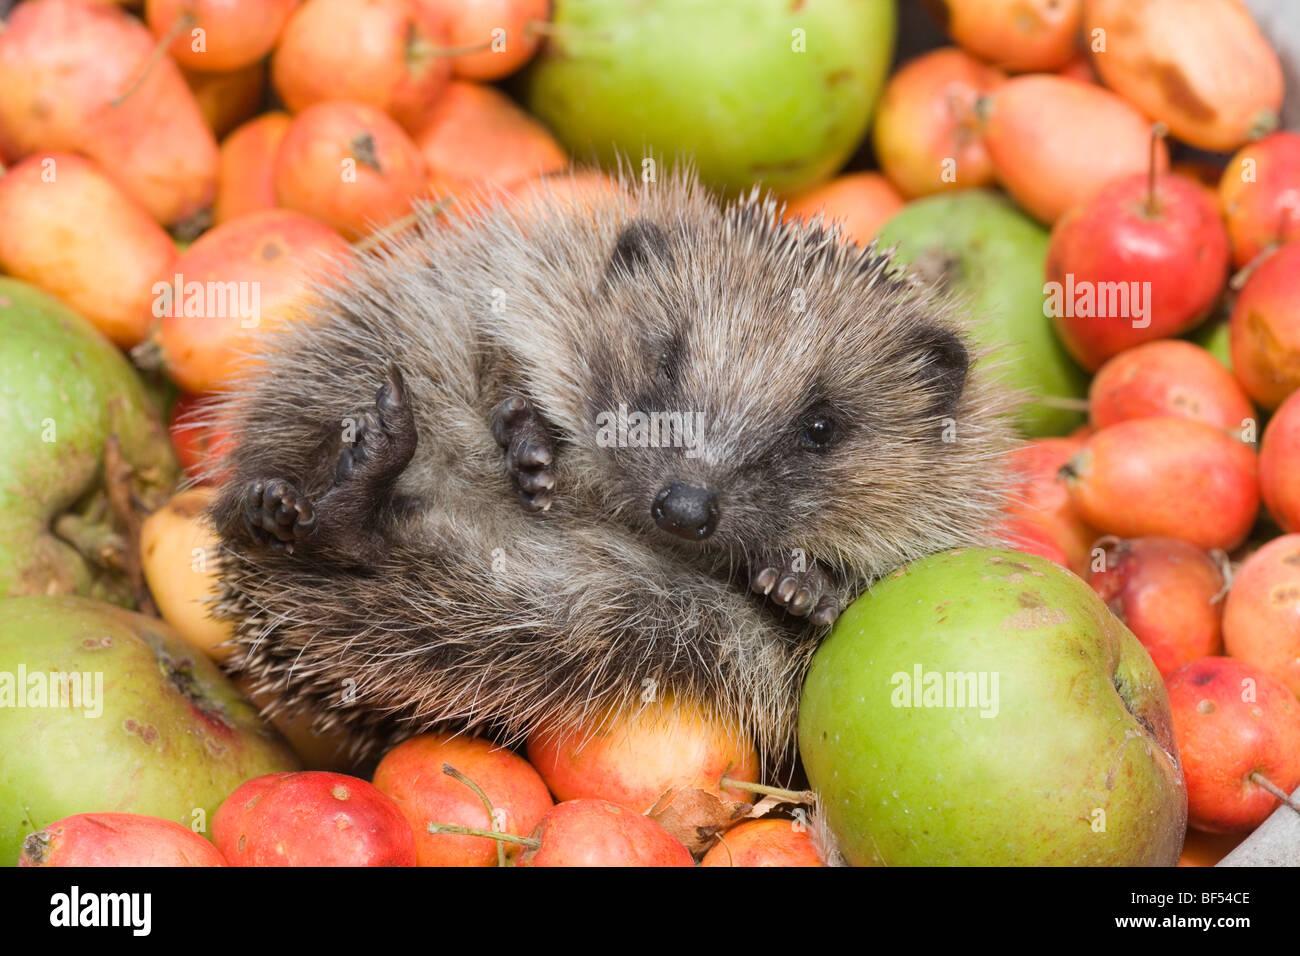 European Hedgehog (Erinaceus europaeus) amongst collected fallen apples (Malus sp. ). Showing soft hair underbelly. - Stock Image